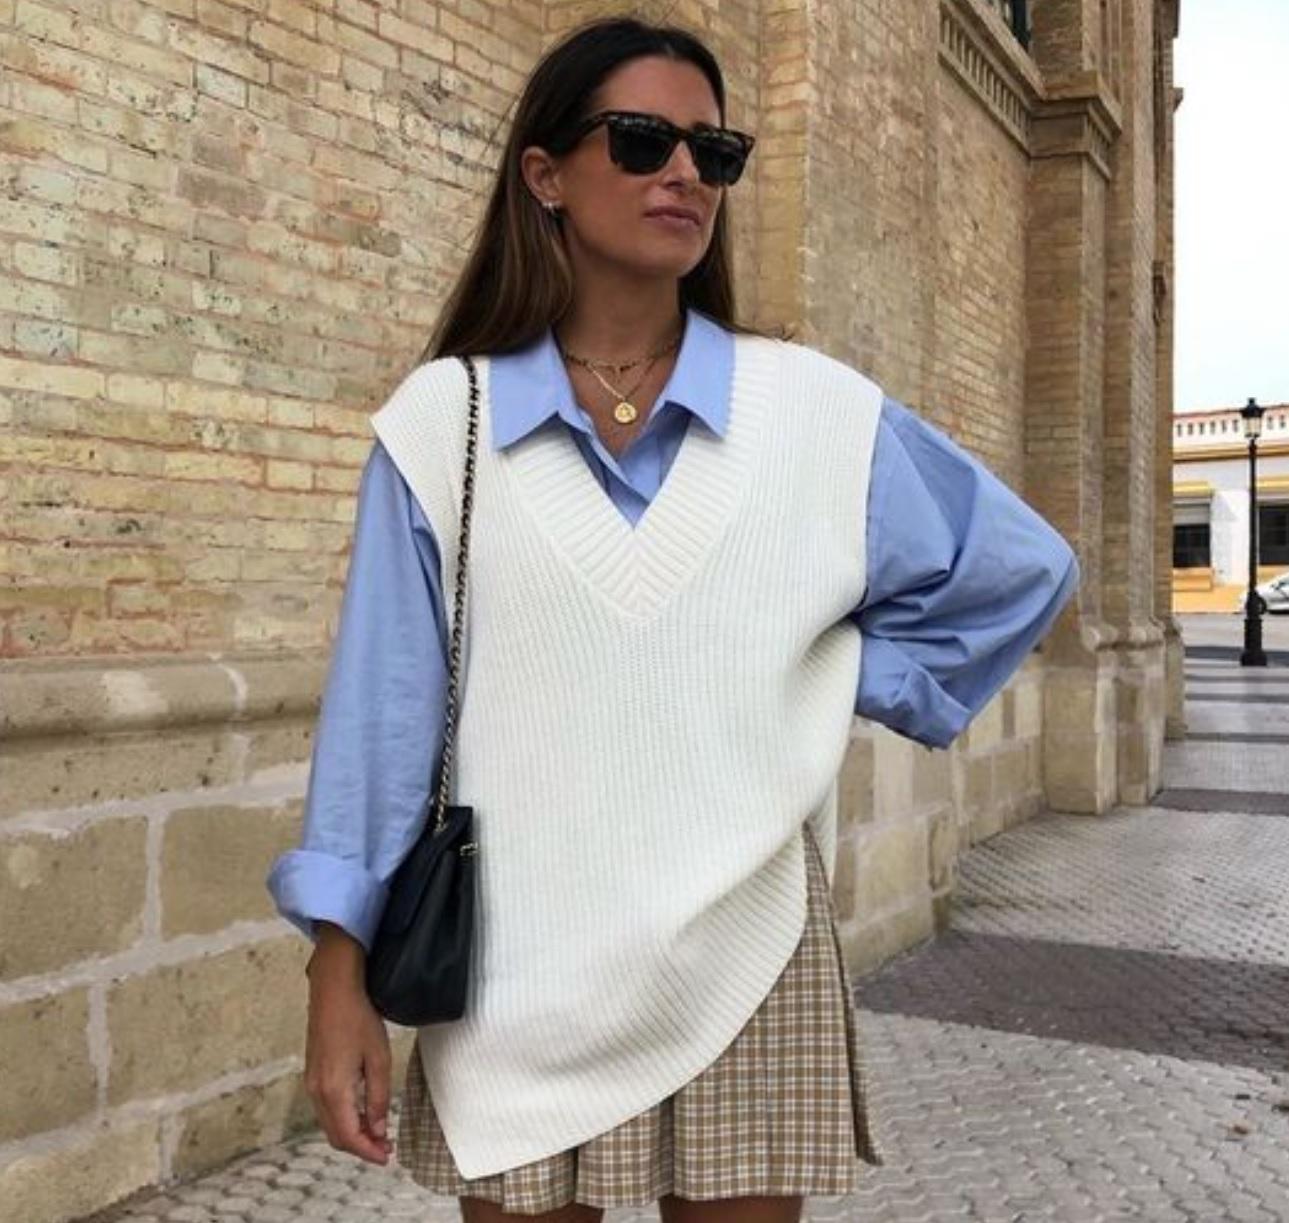 Knitted vest & shirt